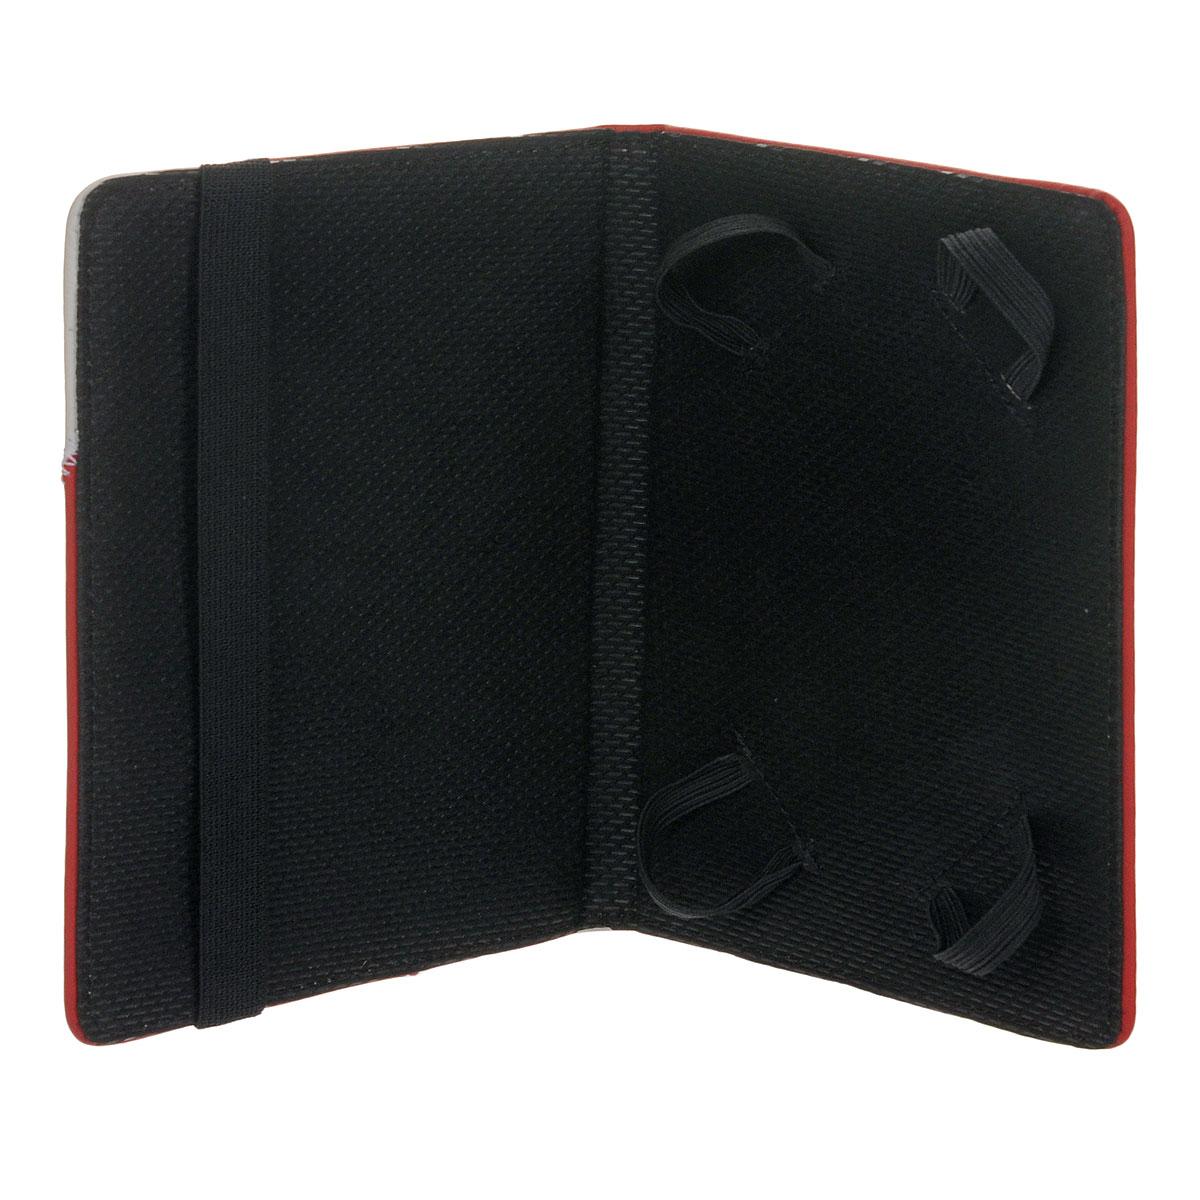 Vivacase Fantasy кожаный чехол-обложка для PocketBook 613/611/622, Red White